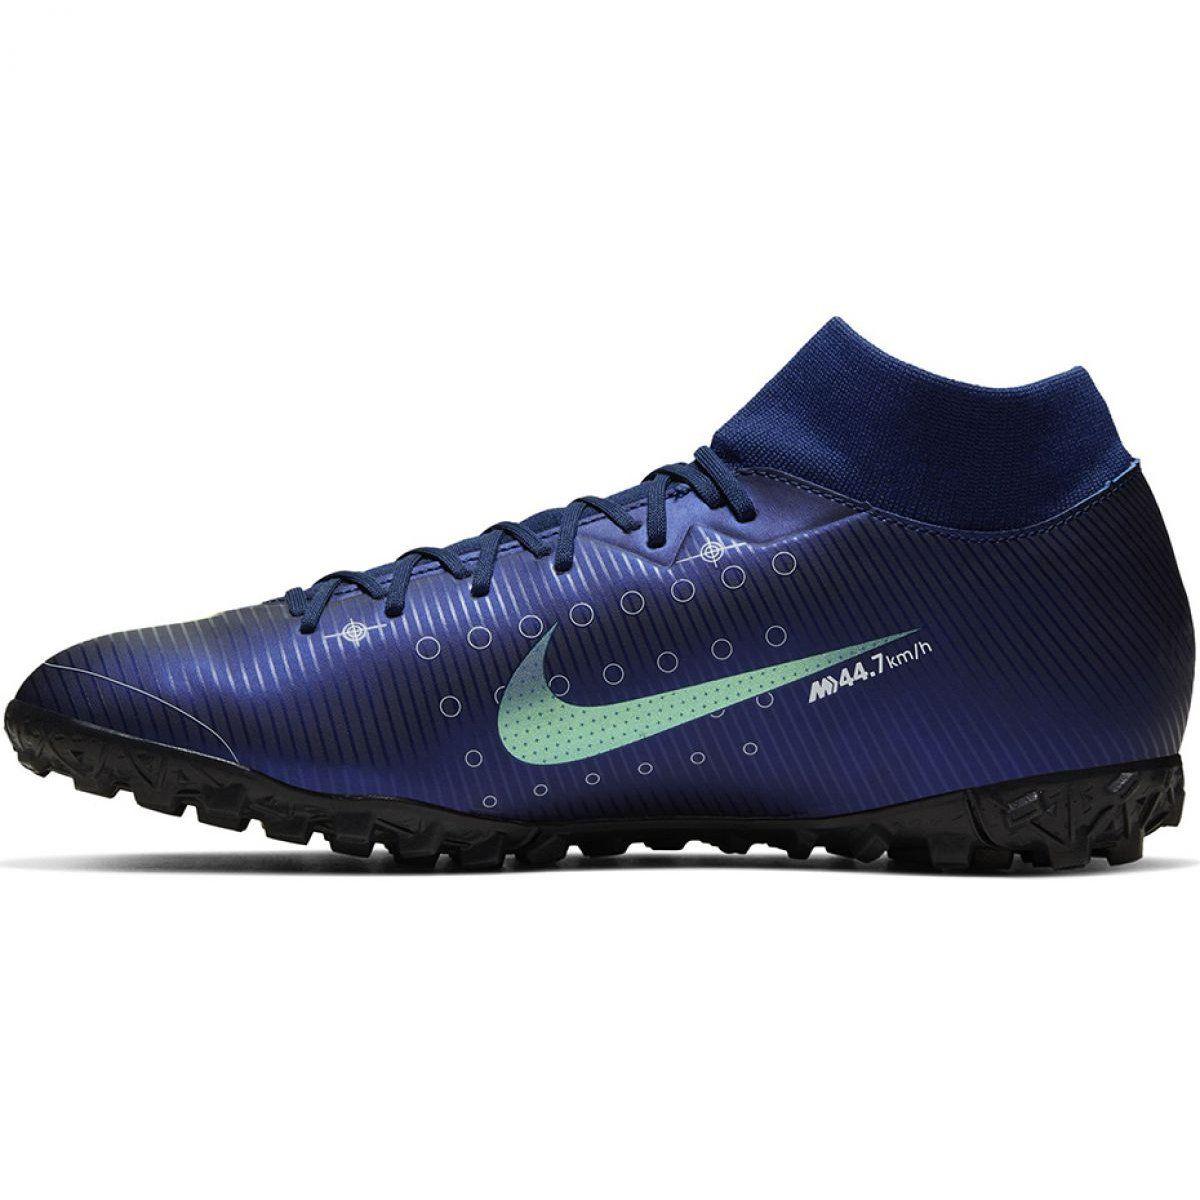 Buty Pilkarskie Nike Mercurial Superfly 7 Academy Mds Tf M Bq5435 401 Granatowe Niebieskie Football Shoes Soccer Shoes Shoes